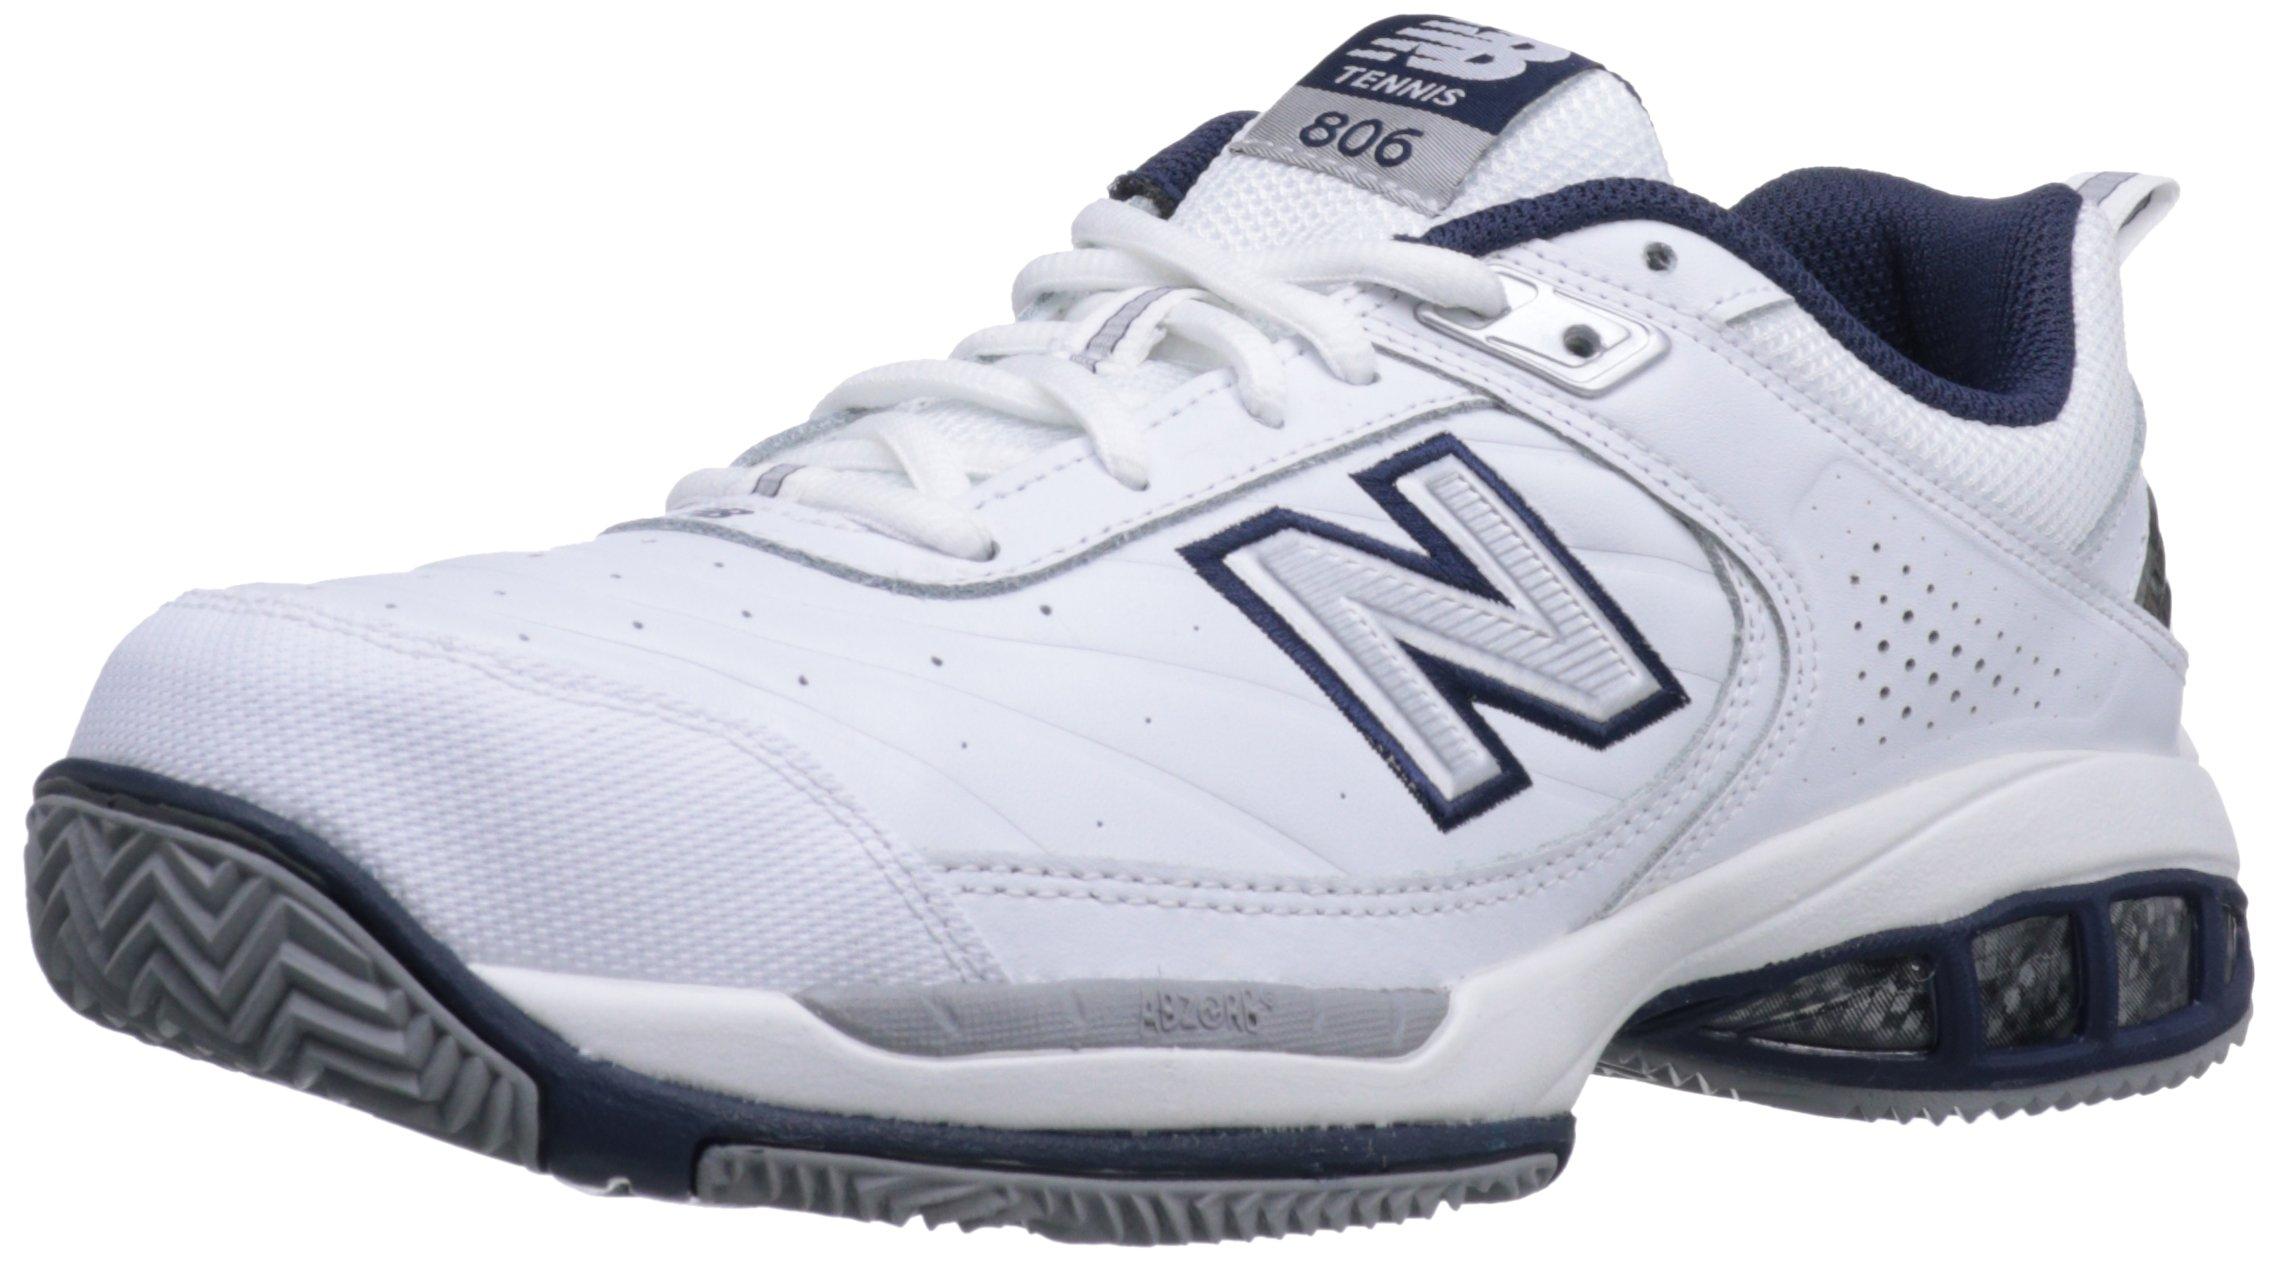 New Balance Men's mc806 Tennis Shoe, White, 14 4E US by New Balance